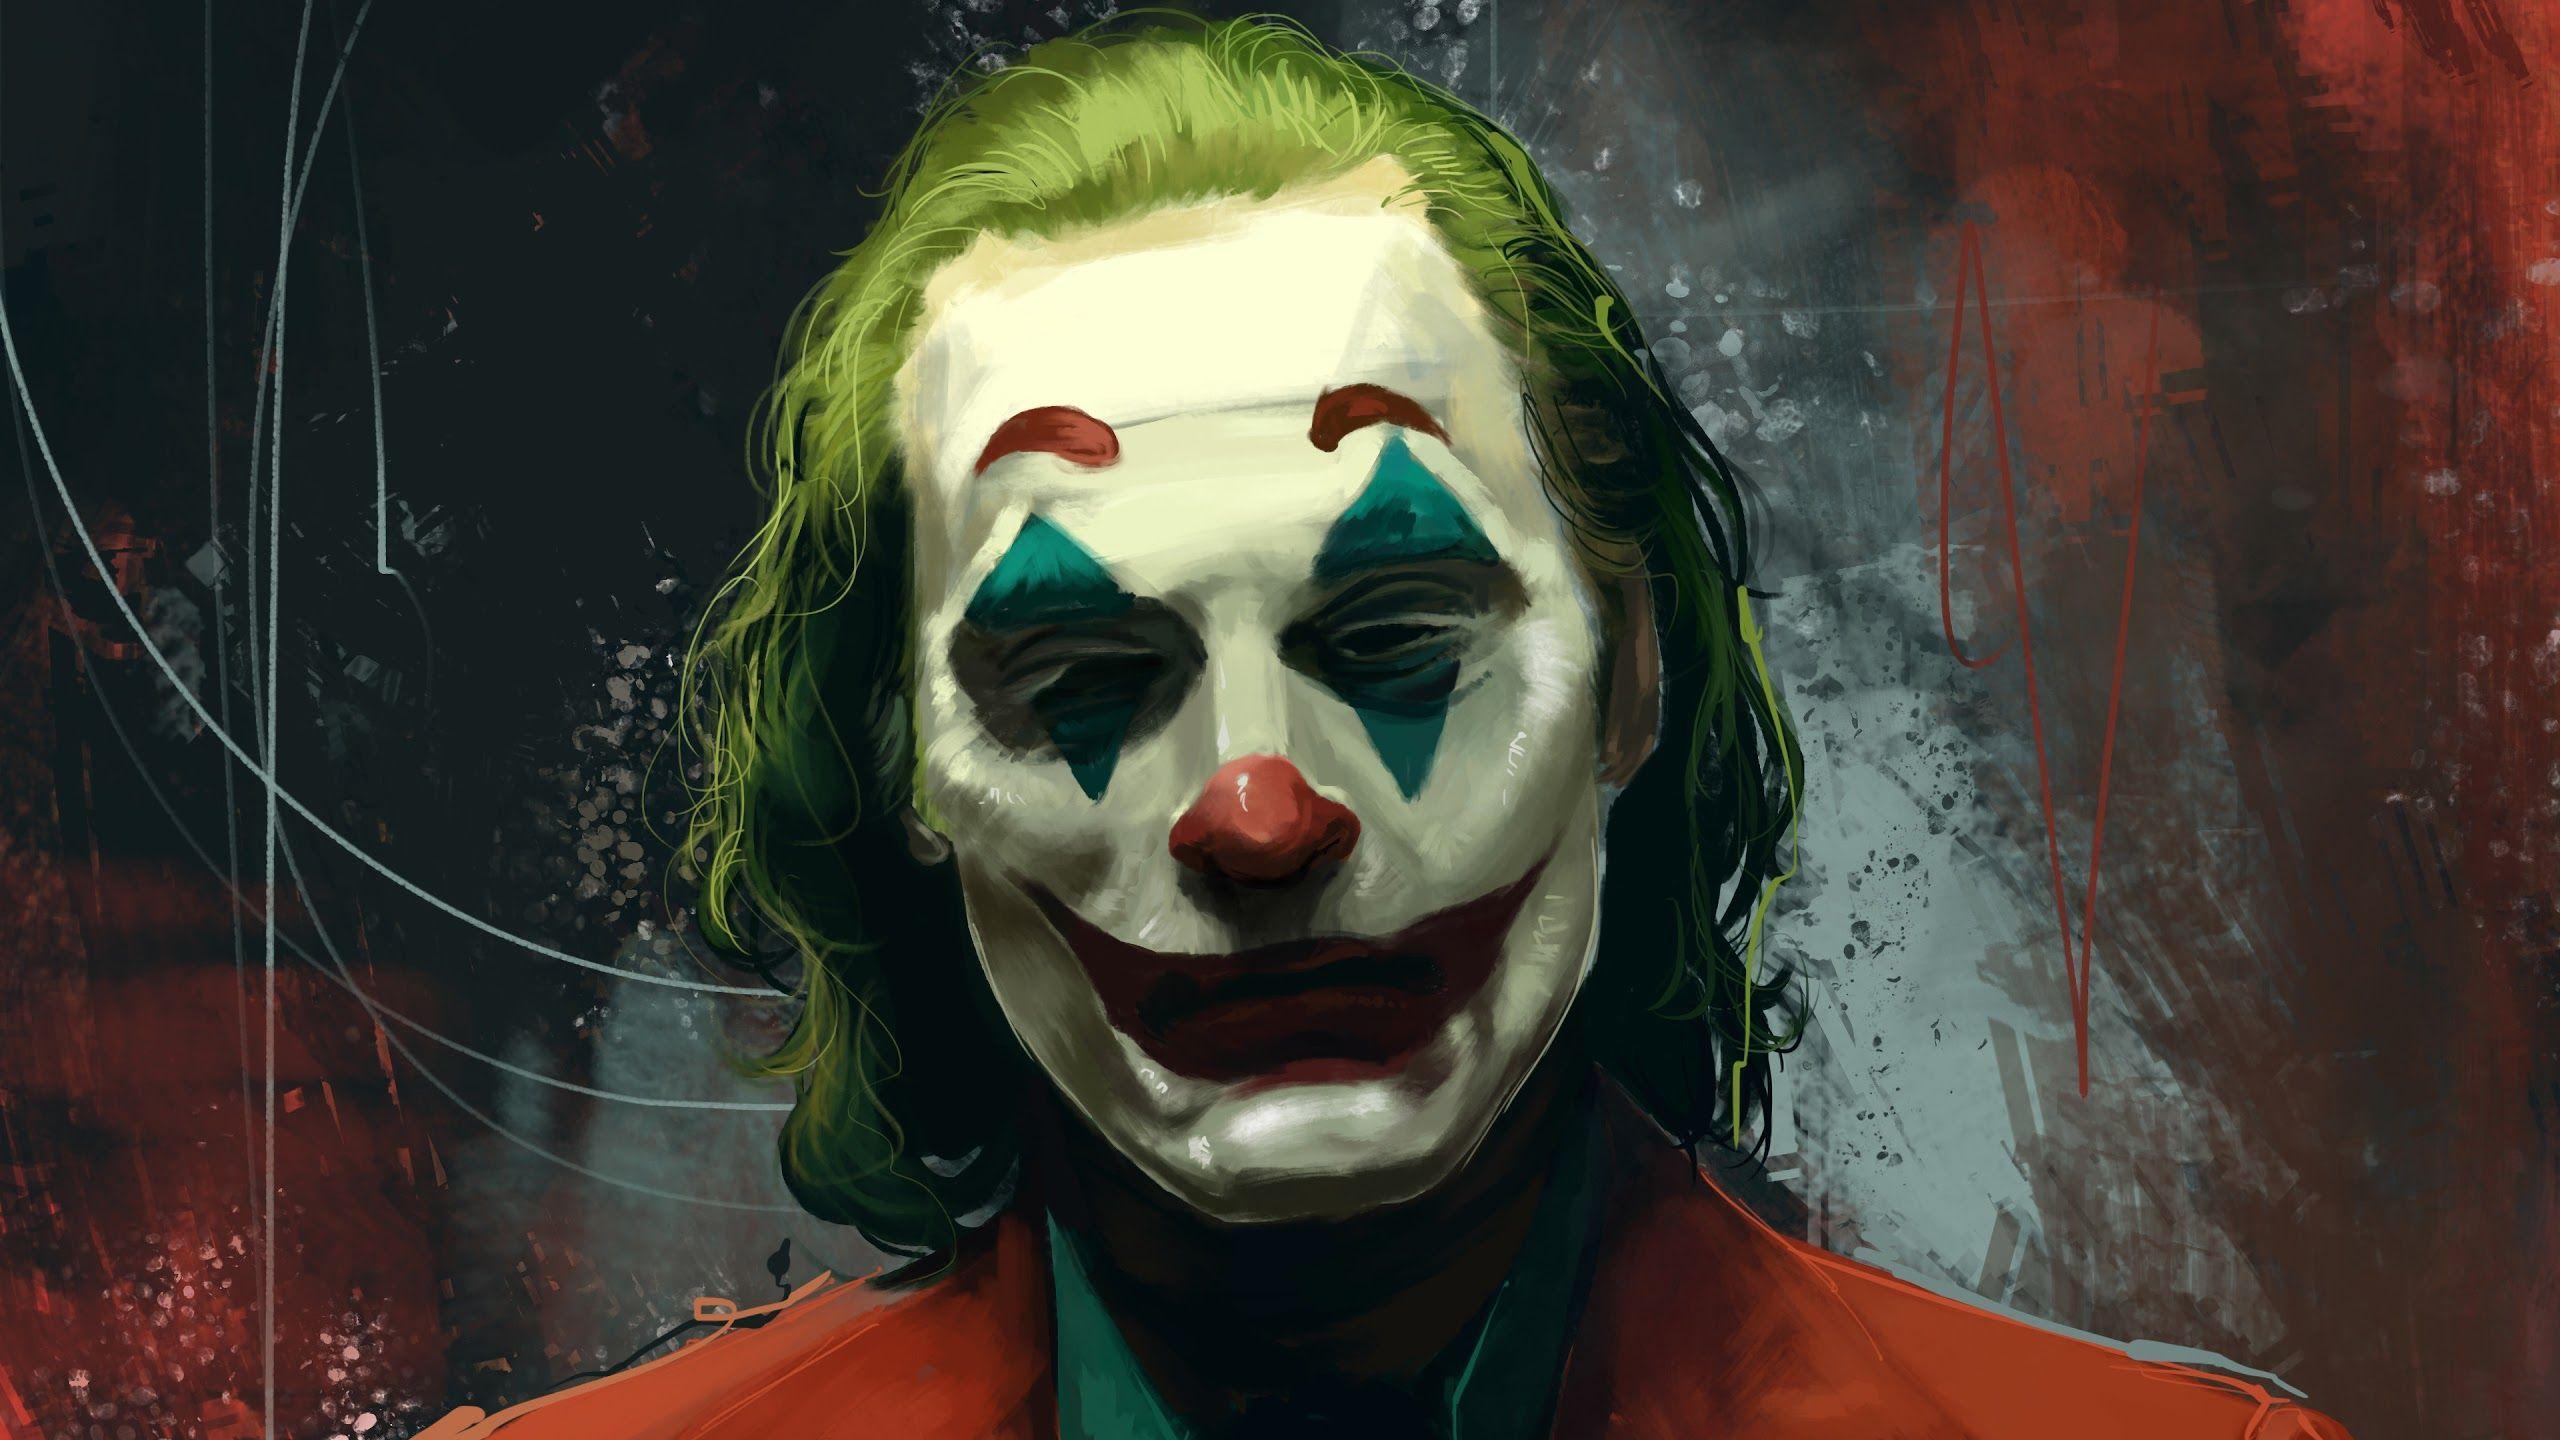 Ideas For Desktop Pc Joker Wallpaper 4k 2019 Pictures In 2020 Joker Wallpapers Joker Hd Wallpaper Joker Images